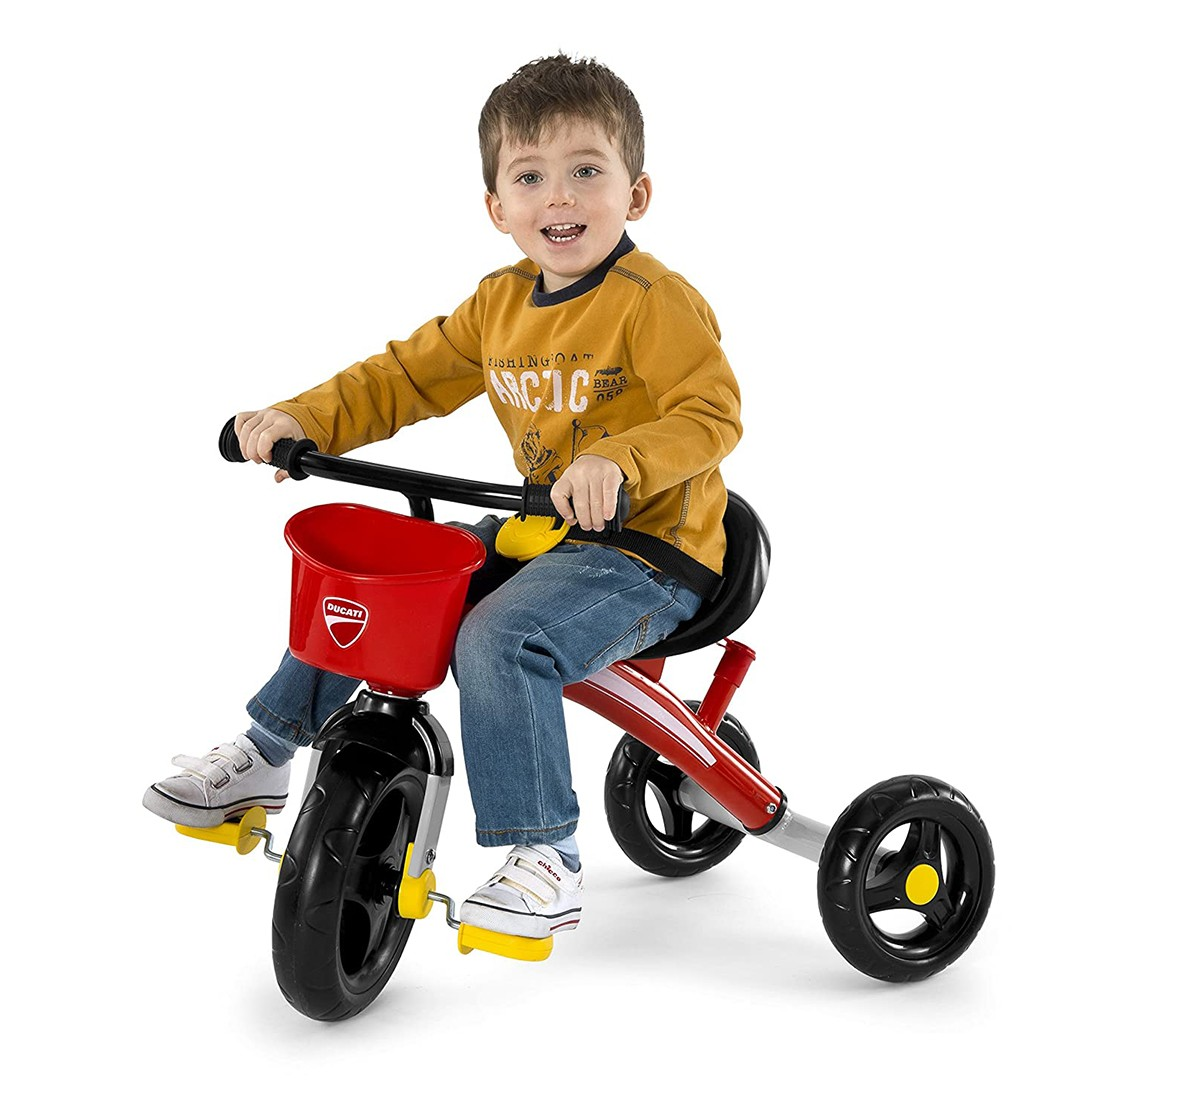 Chicco U-Go Ducati Trike for Kids age 18M +